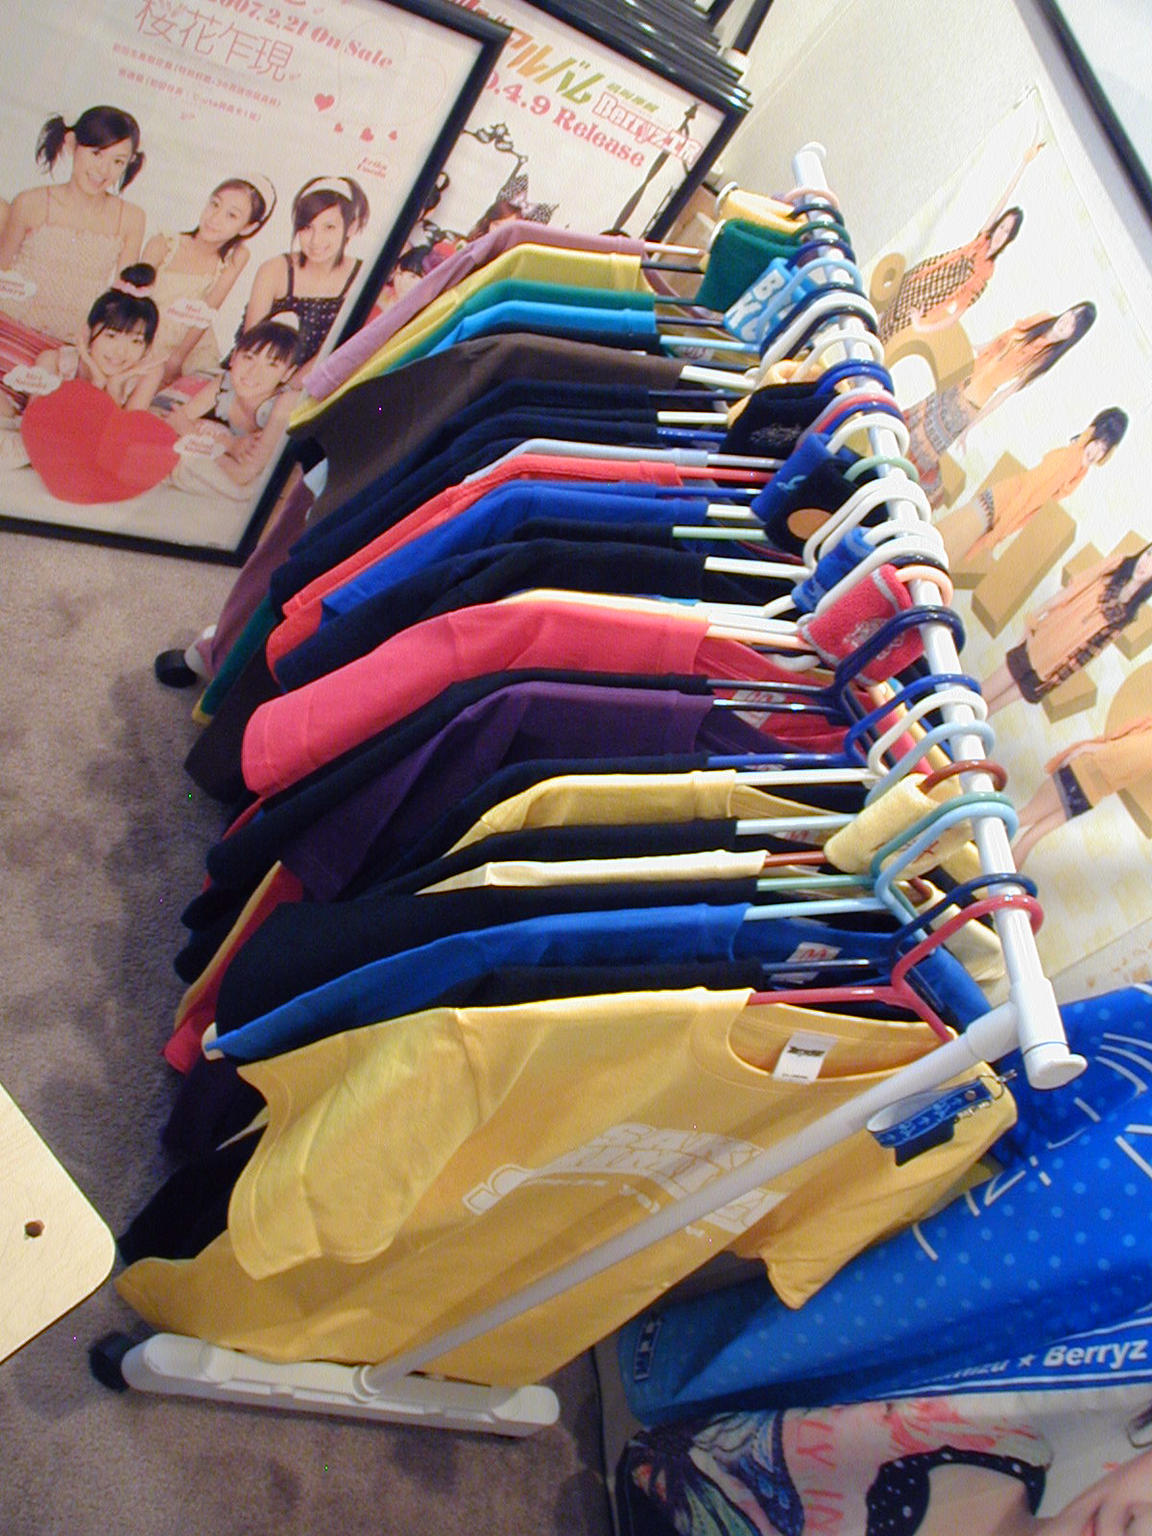 H!P T-shirts galore!